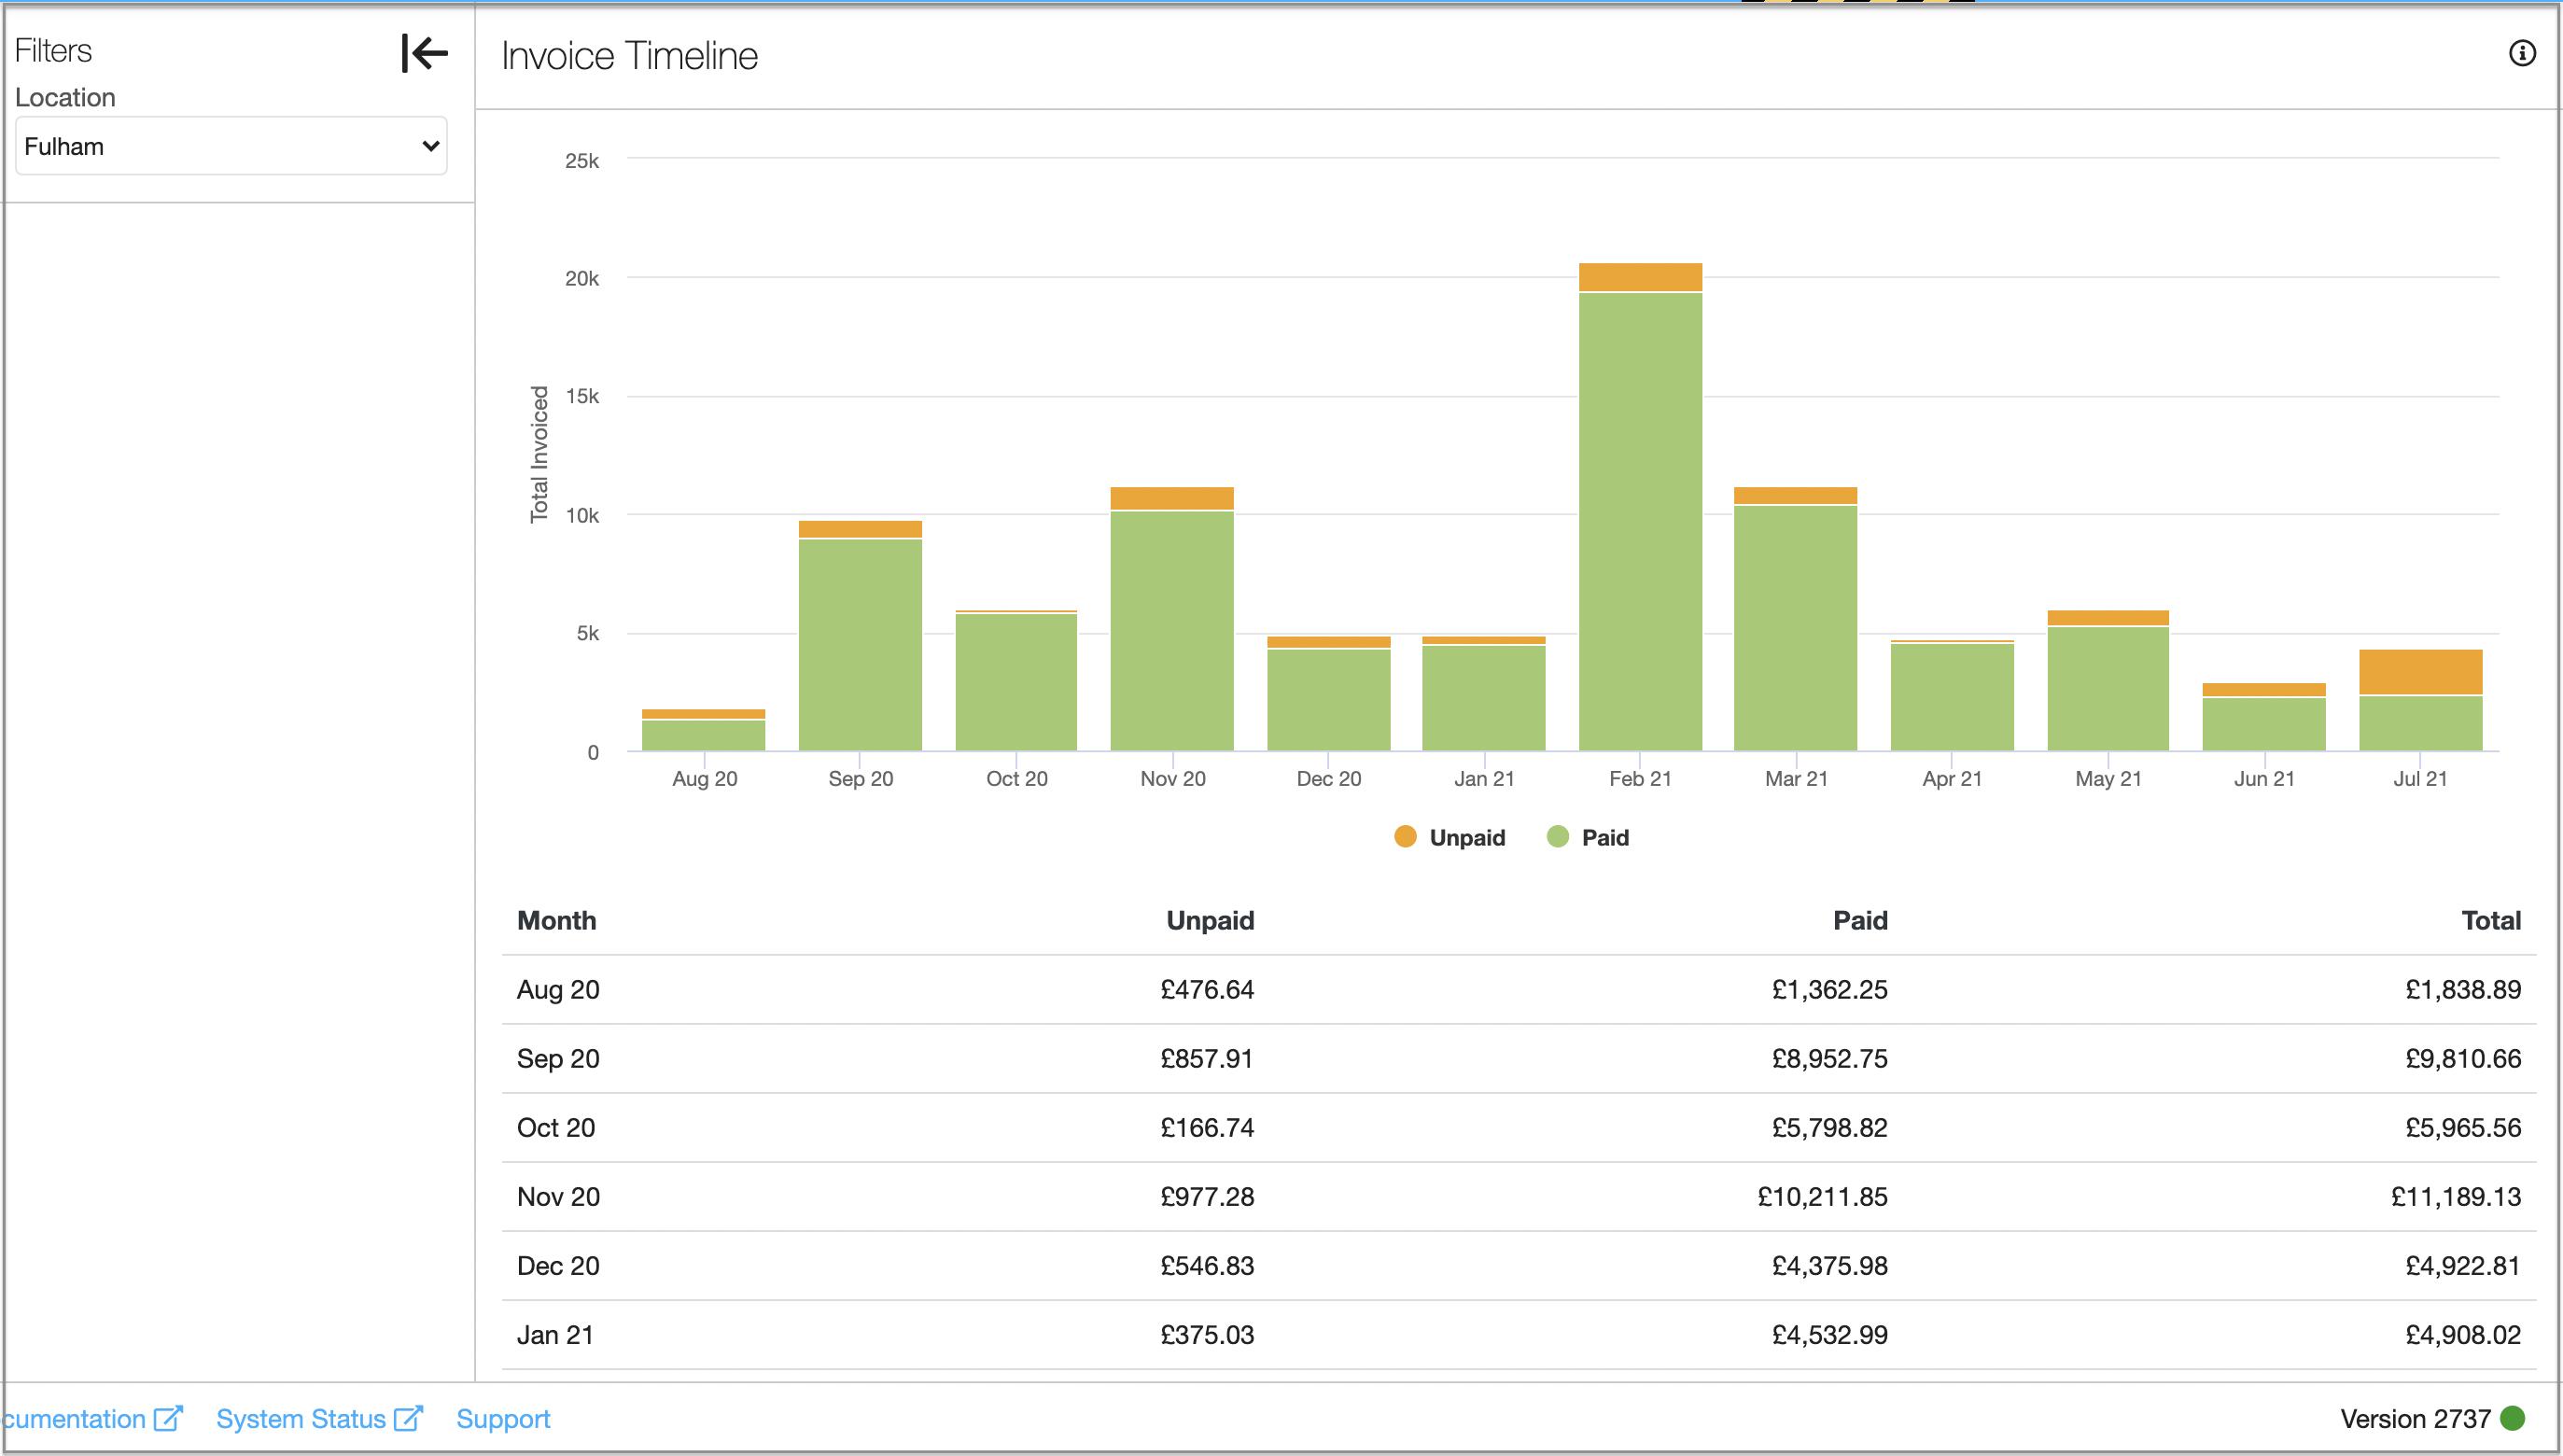 invoice timeline report